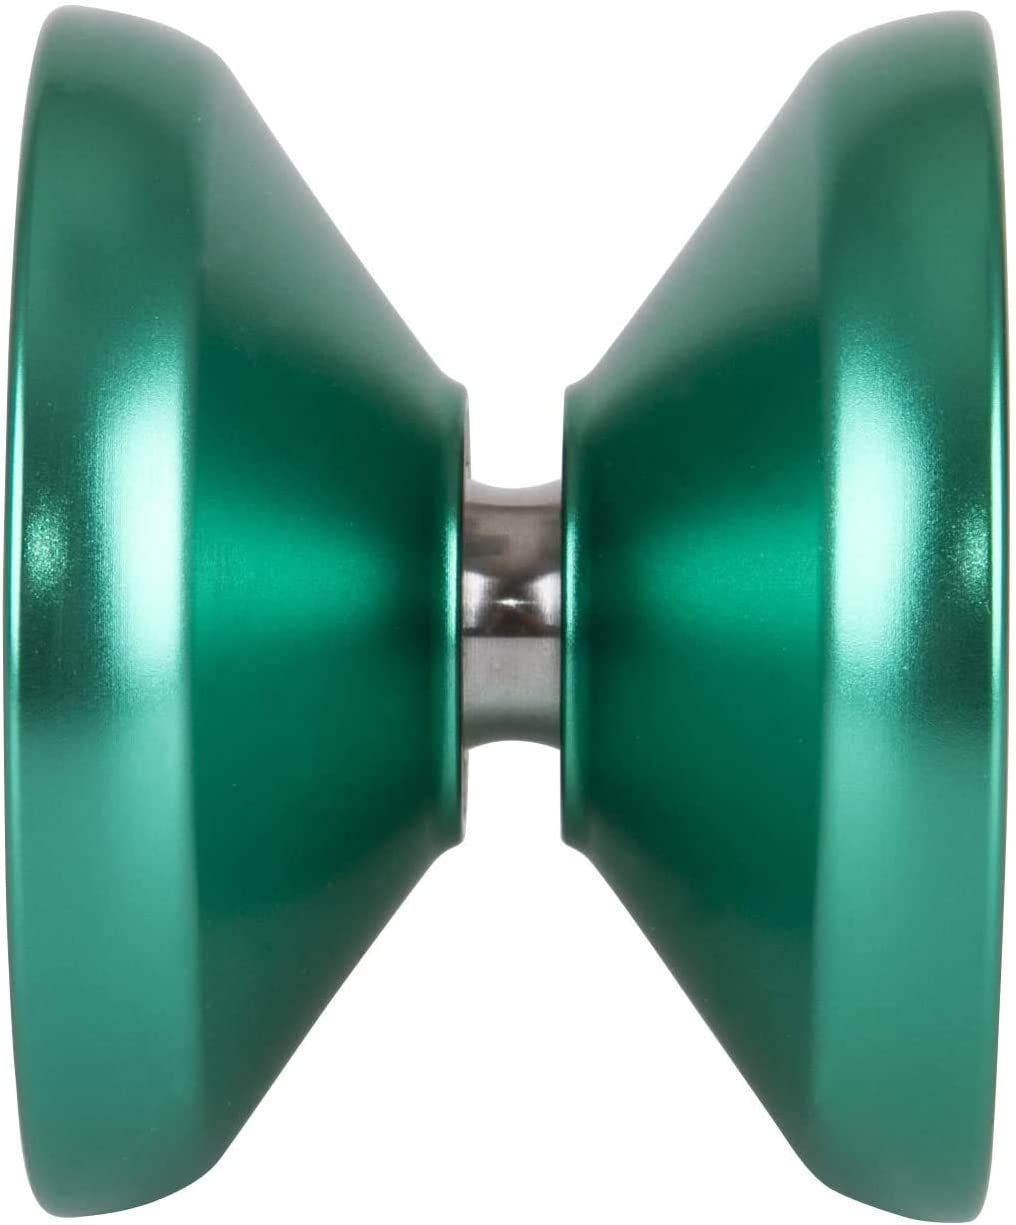 Concave Bearing - Unresponsive Pro Level Aluminum Yo-Yo with Double Rim Red SG Sticker Response Duncan Toys Windrunner Yo-Yo